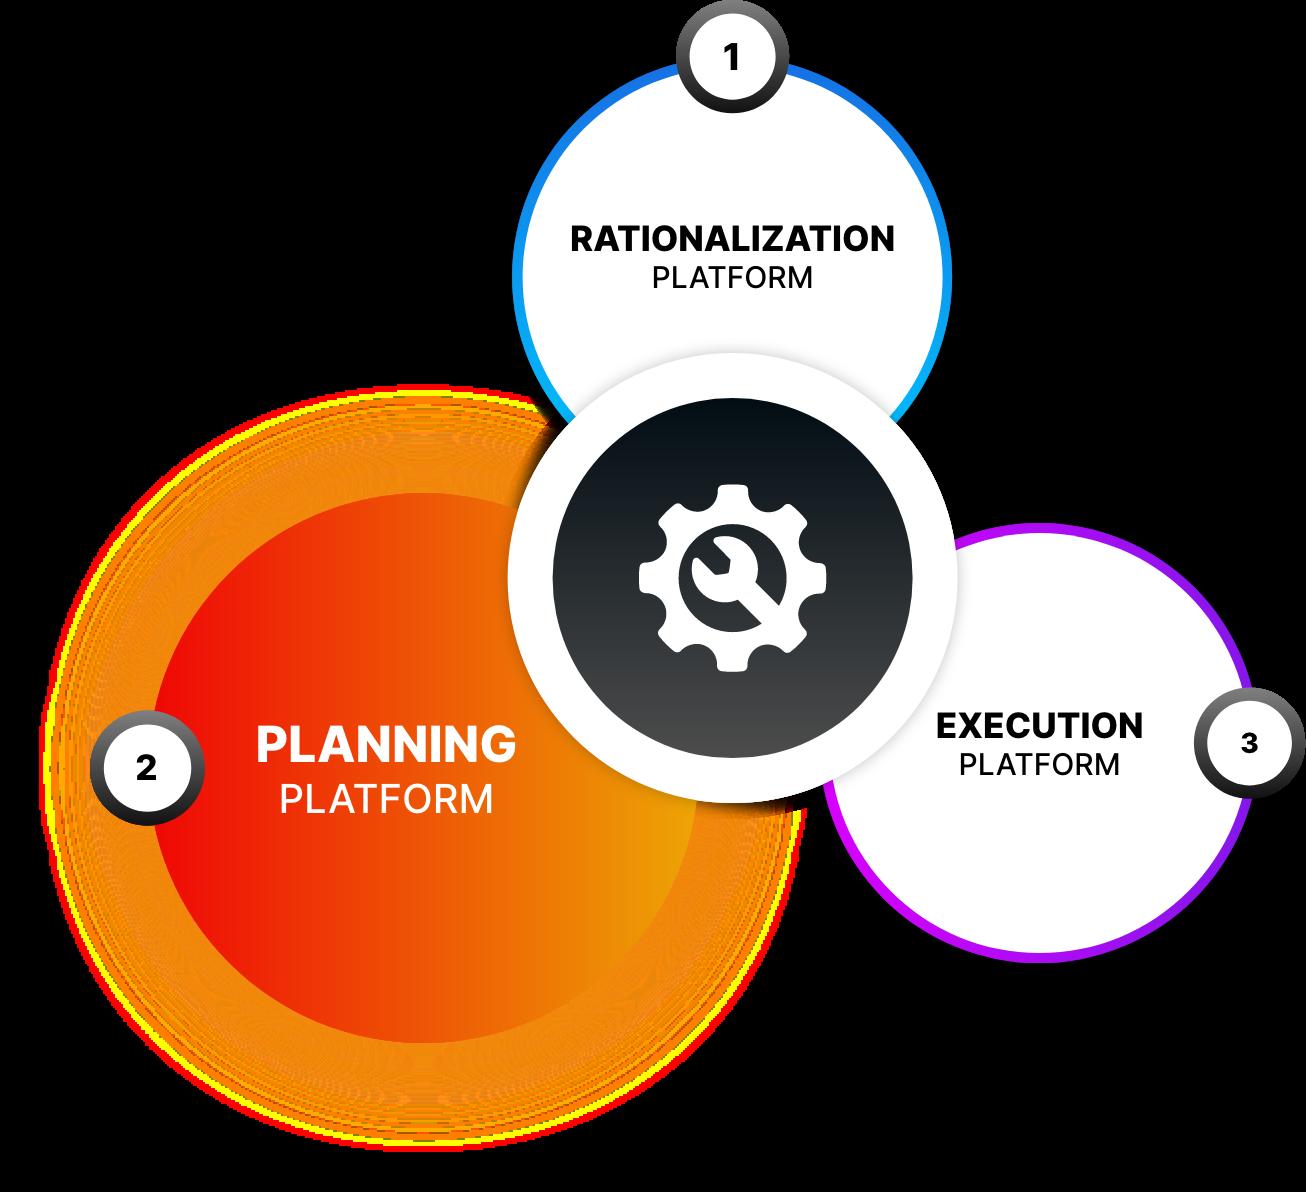 Planning Platform Image